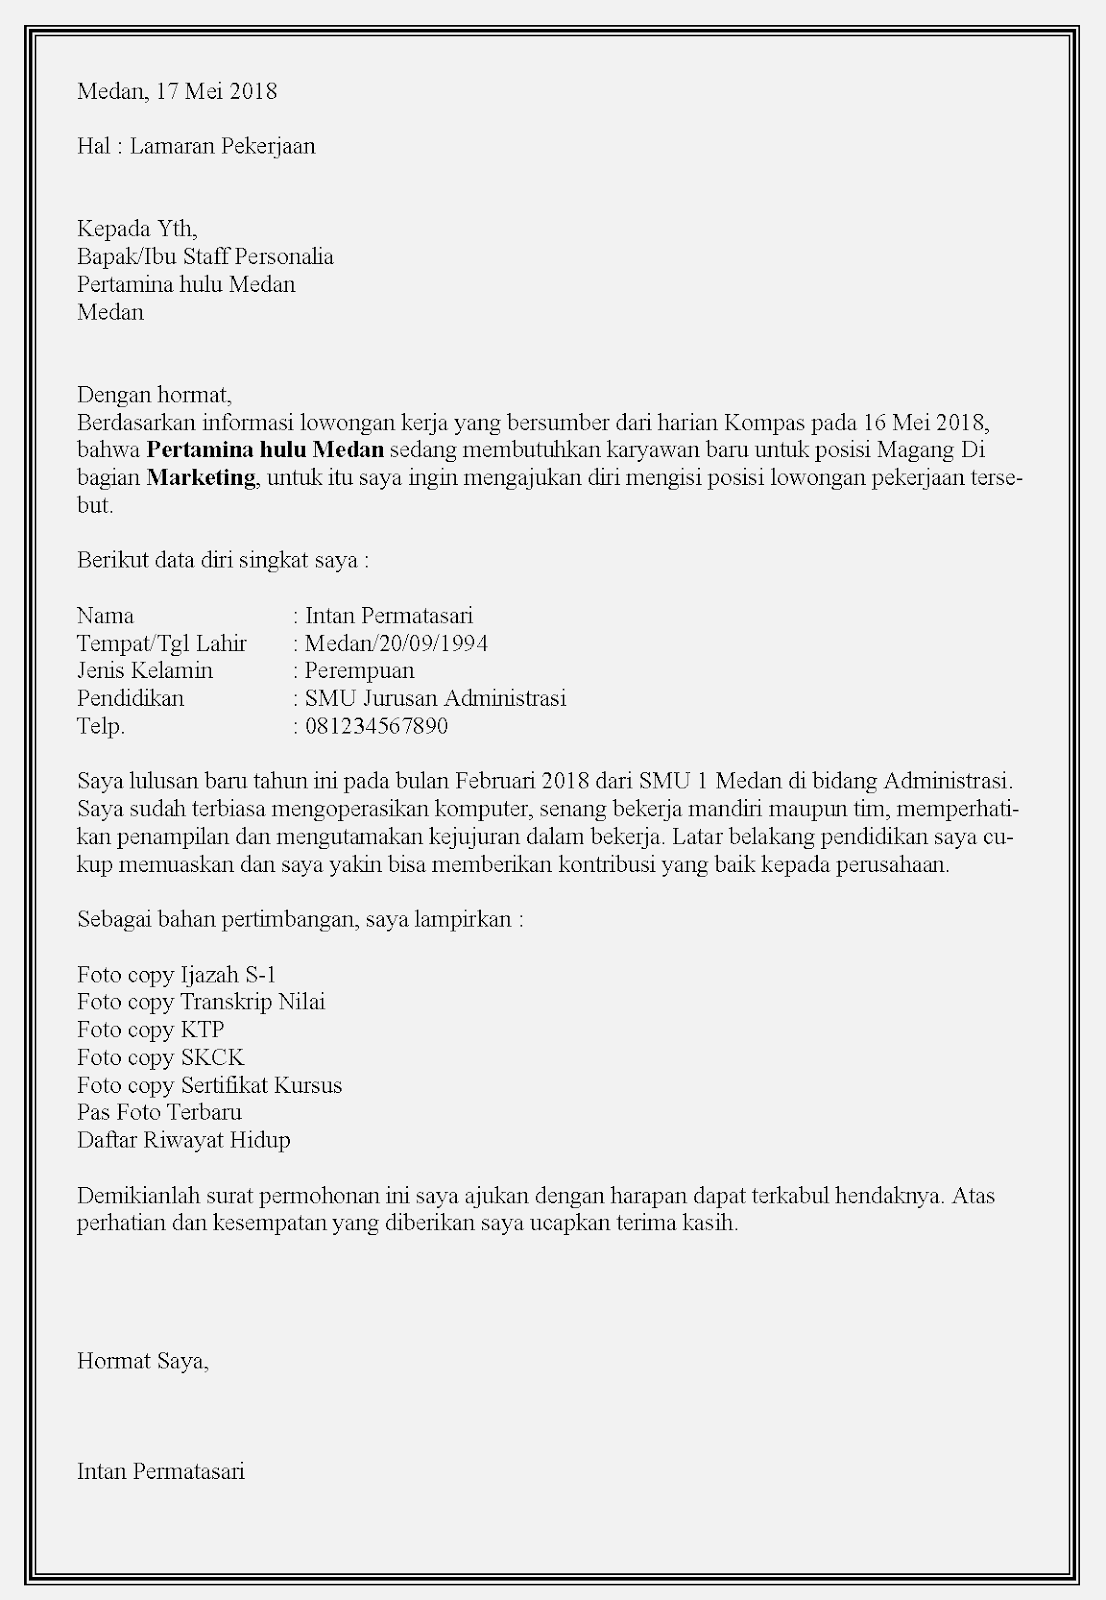 Contoh Surat Lamaran Kerja Bumn Terbaik Di Indonesia Contoh Surat